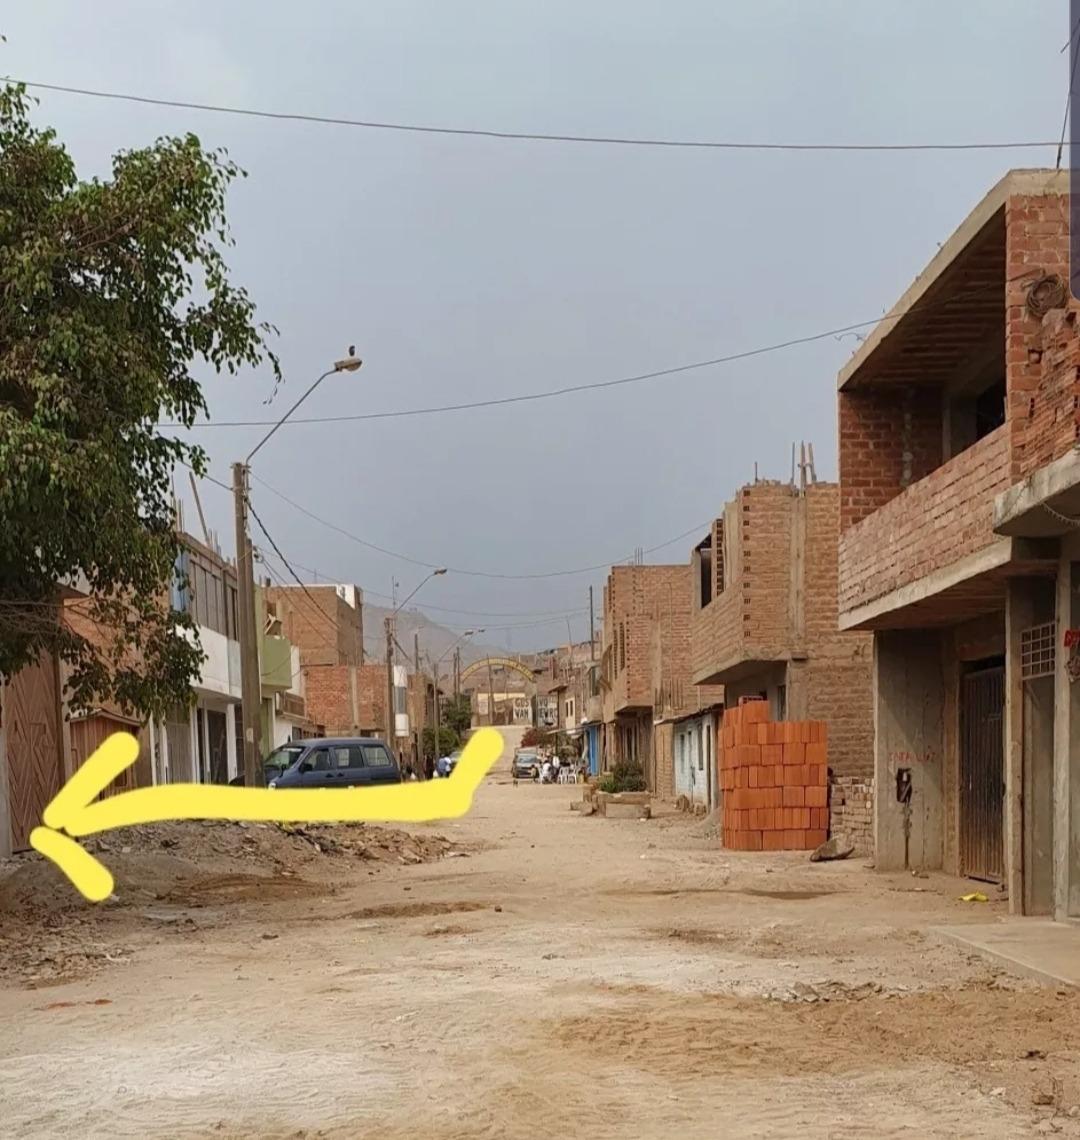 ocasión: venta de terreno en nieveria-huachipa